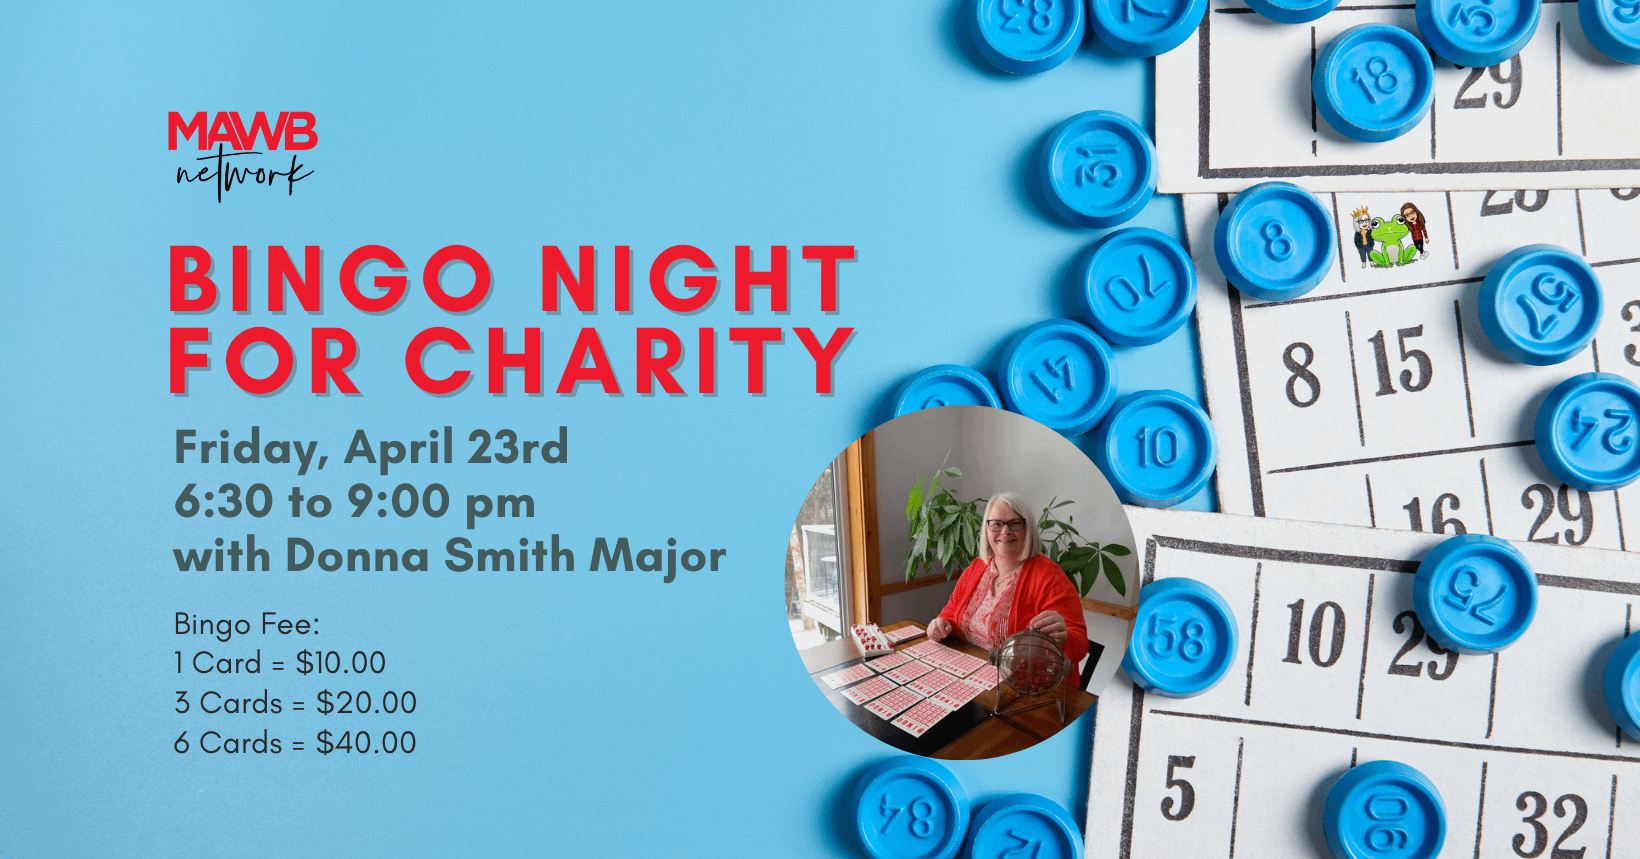 MAWB Events - Bingo Night - April 23